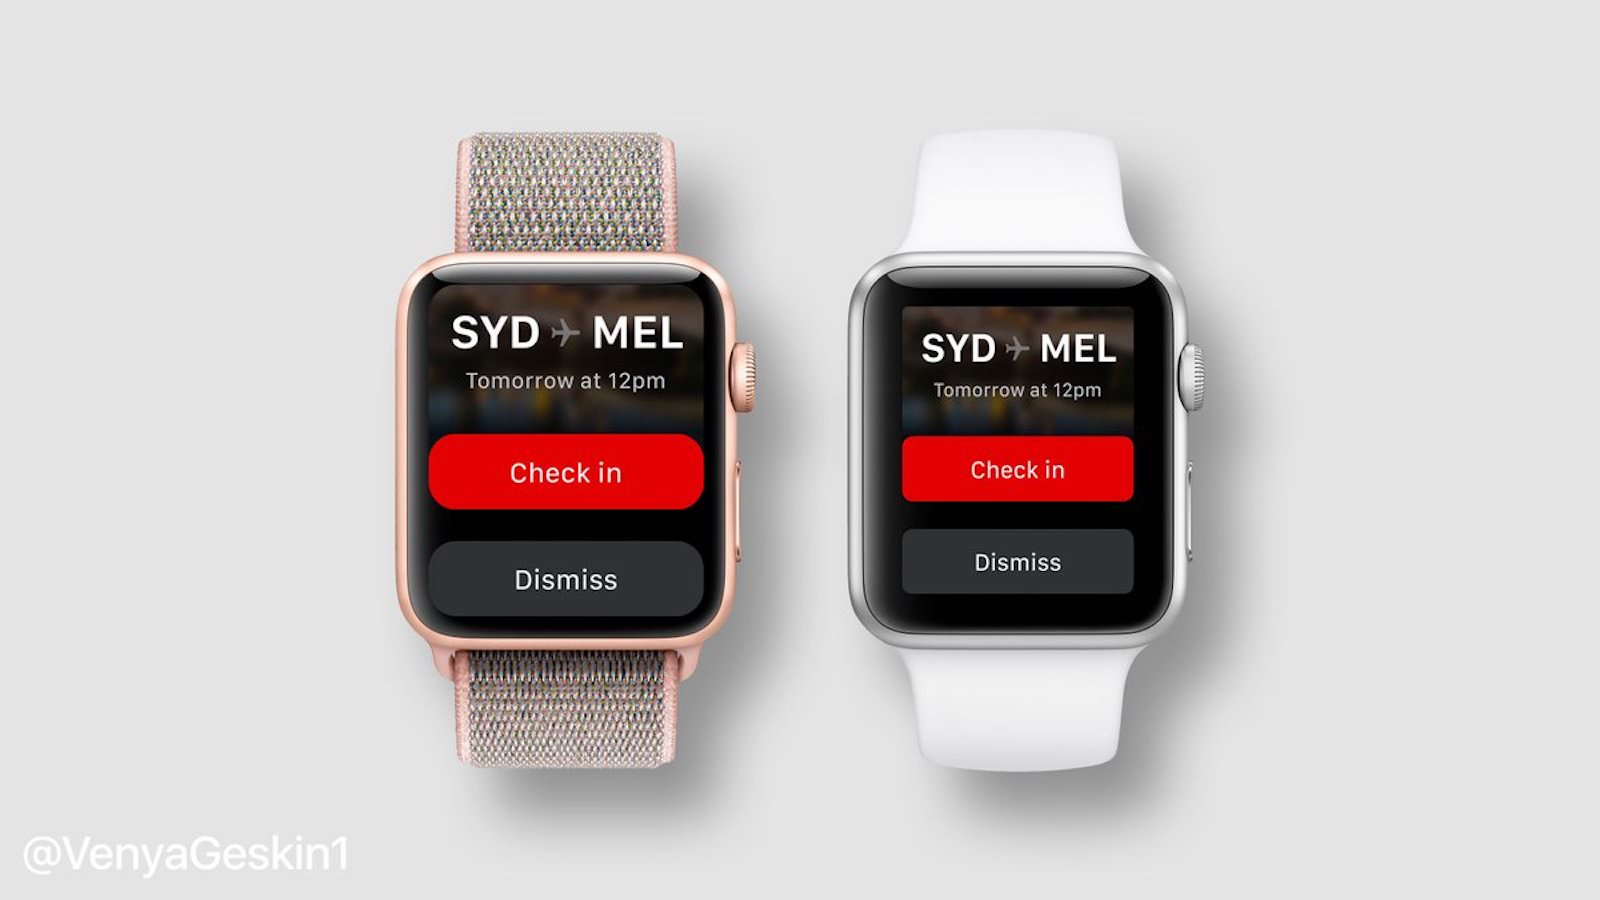 Apple-Watch-Series-4-Concept-image-3.jpg